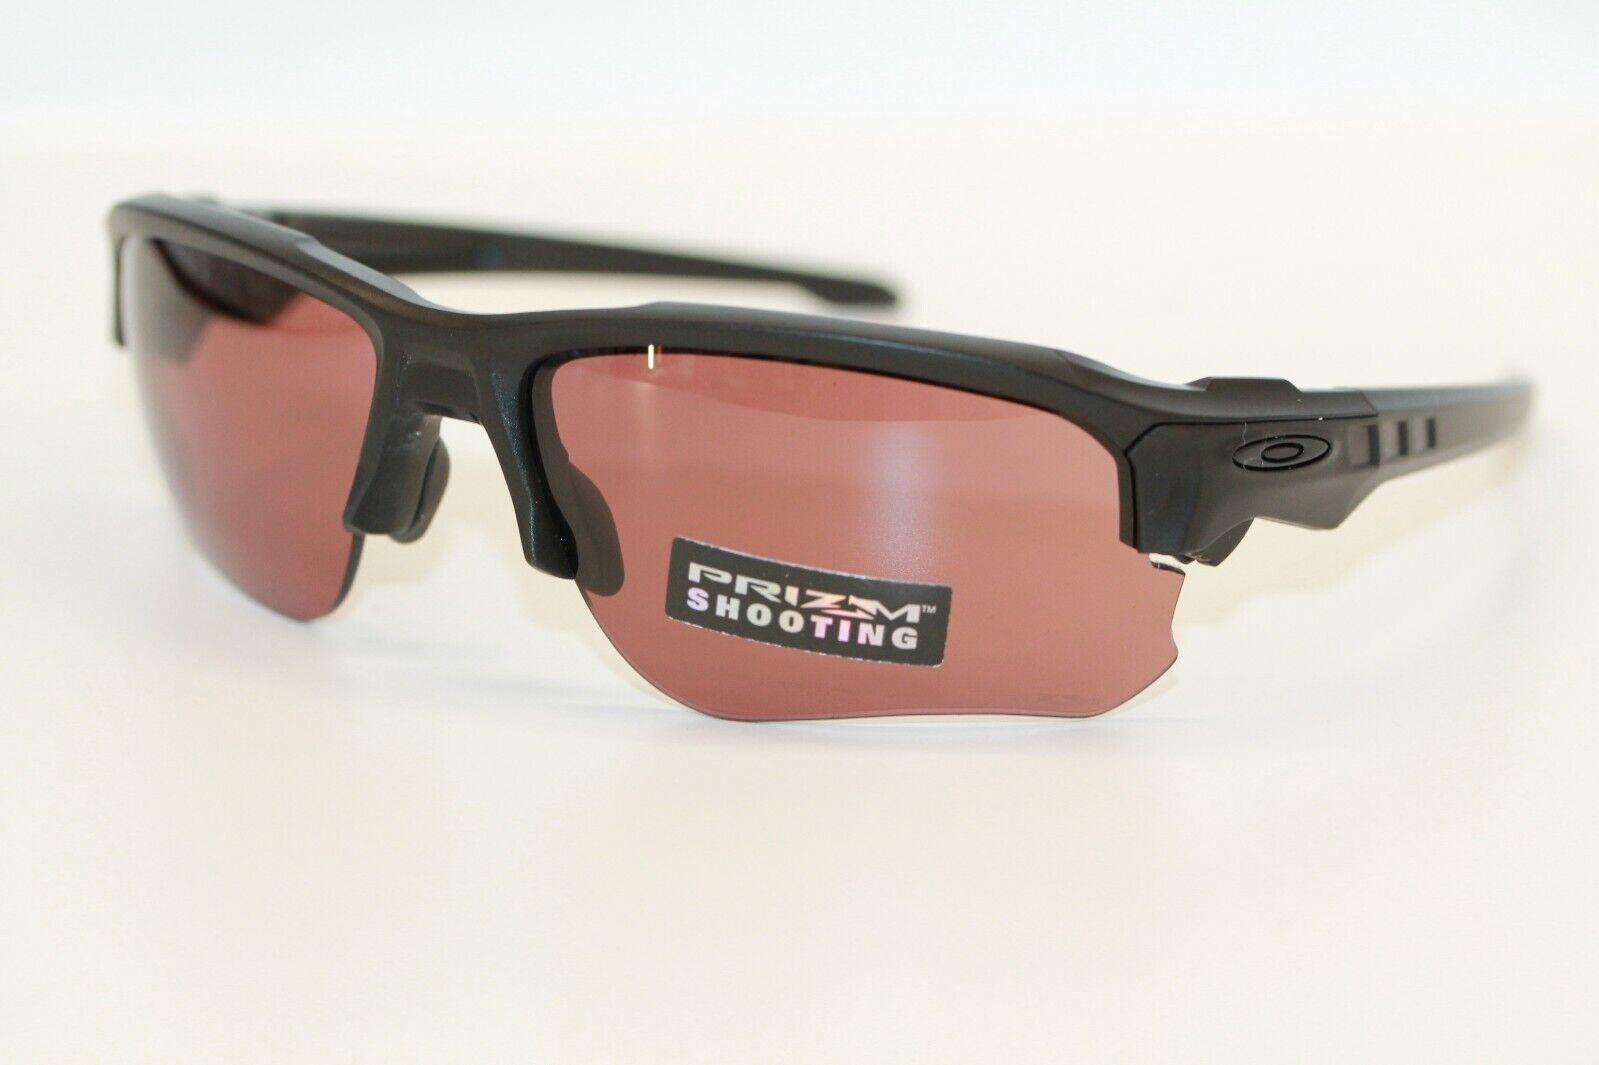 oakley-si-speed-jacket-sunglasses-oo9228-04-matte-black-frame-w-prizm-tr22-lens